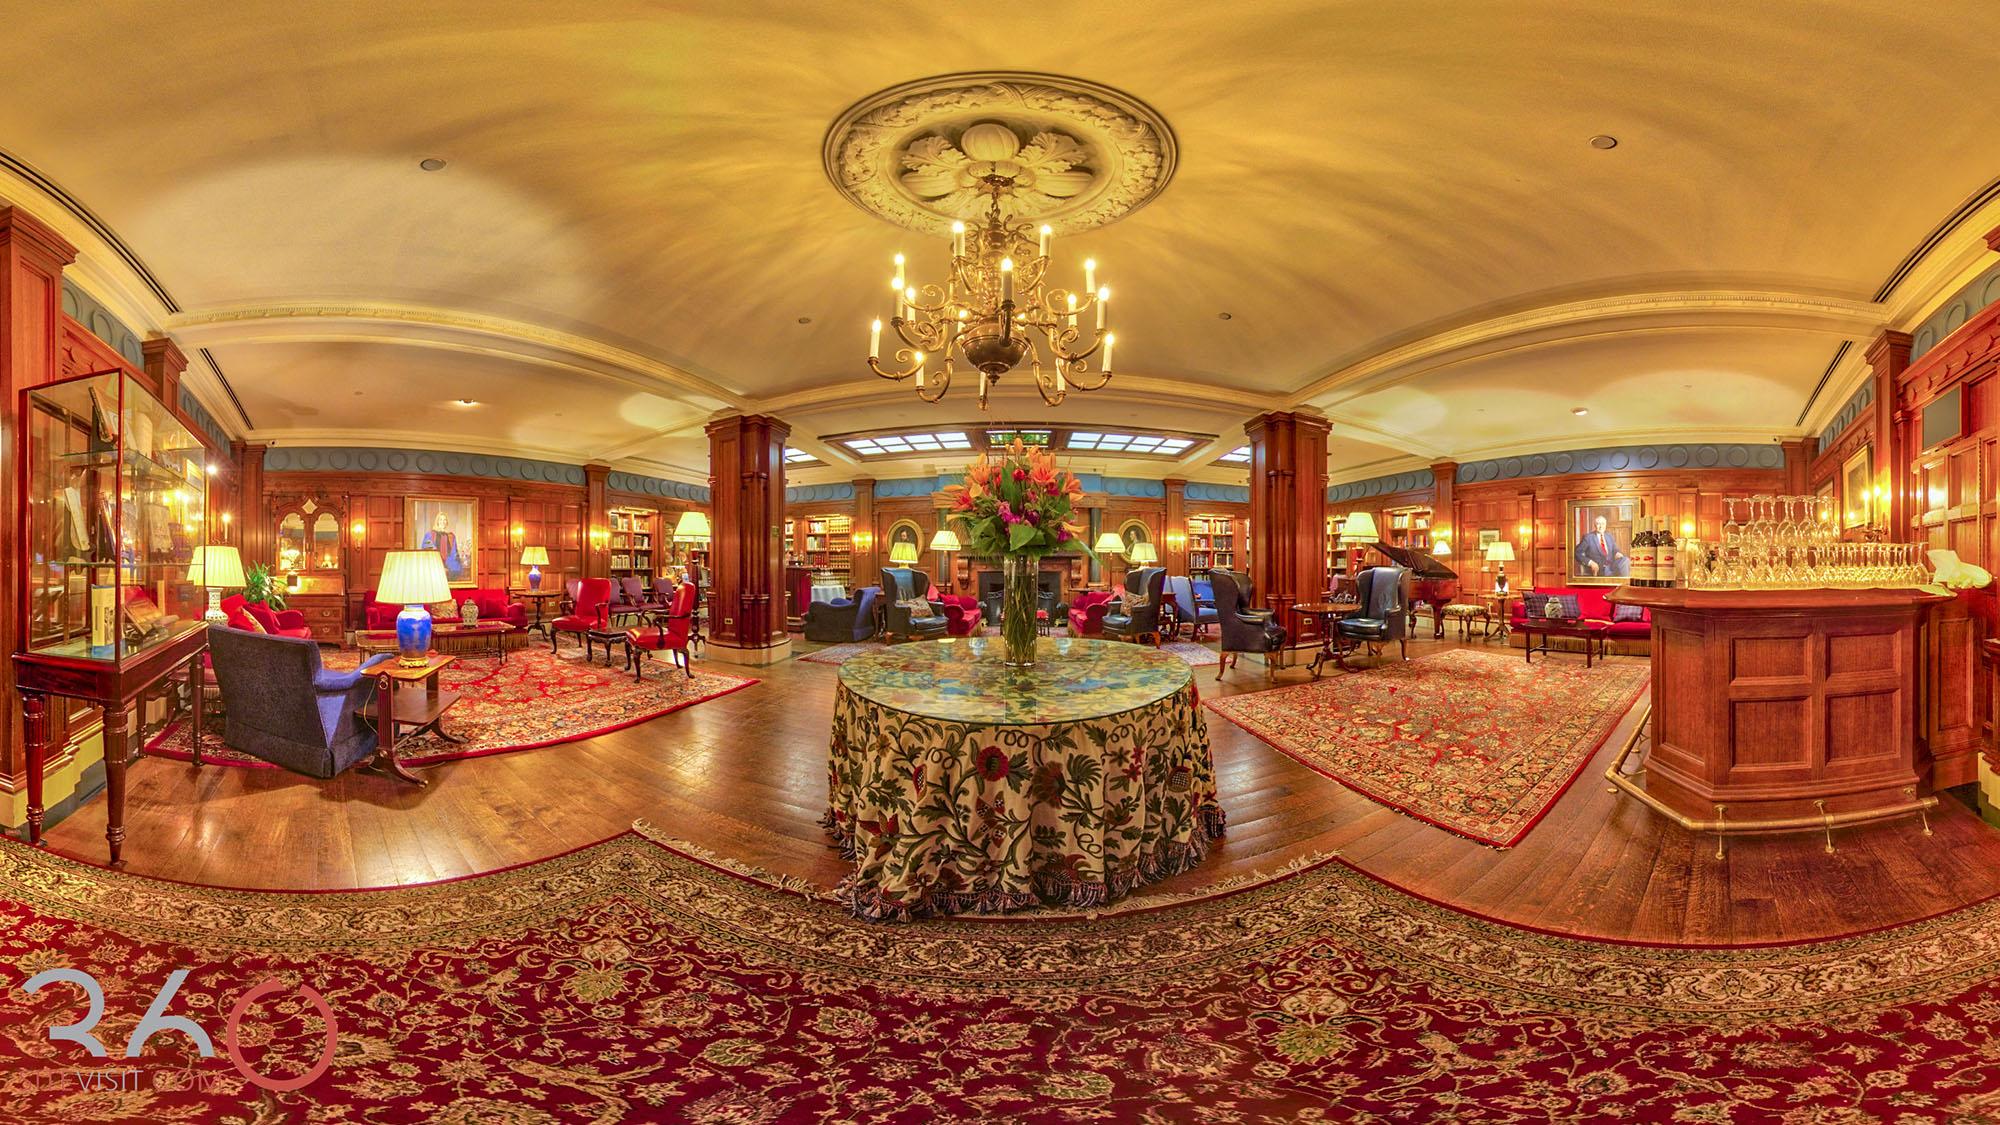 60-Penn Club NYC event venue virtual tour by 360sitevisit